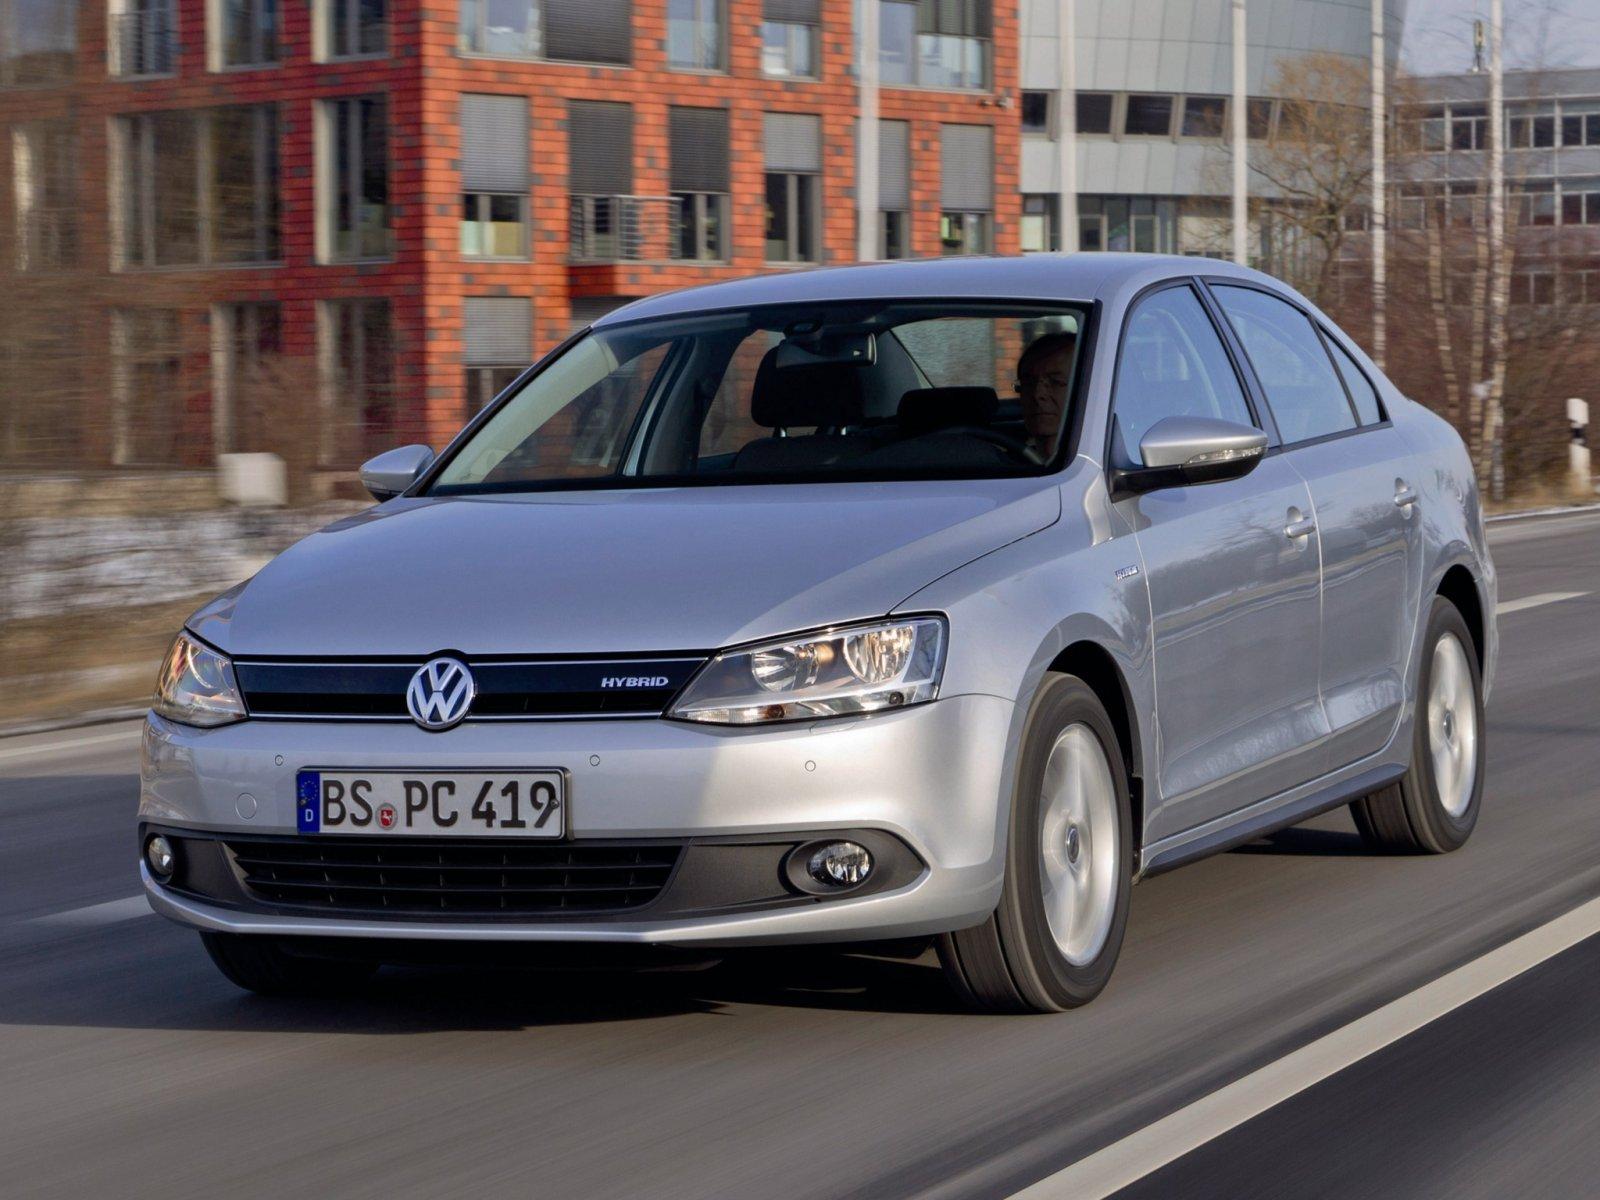 Продажа Volkswagen в Екатеринбурге